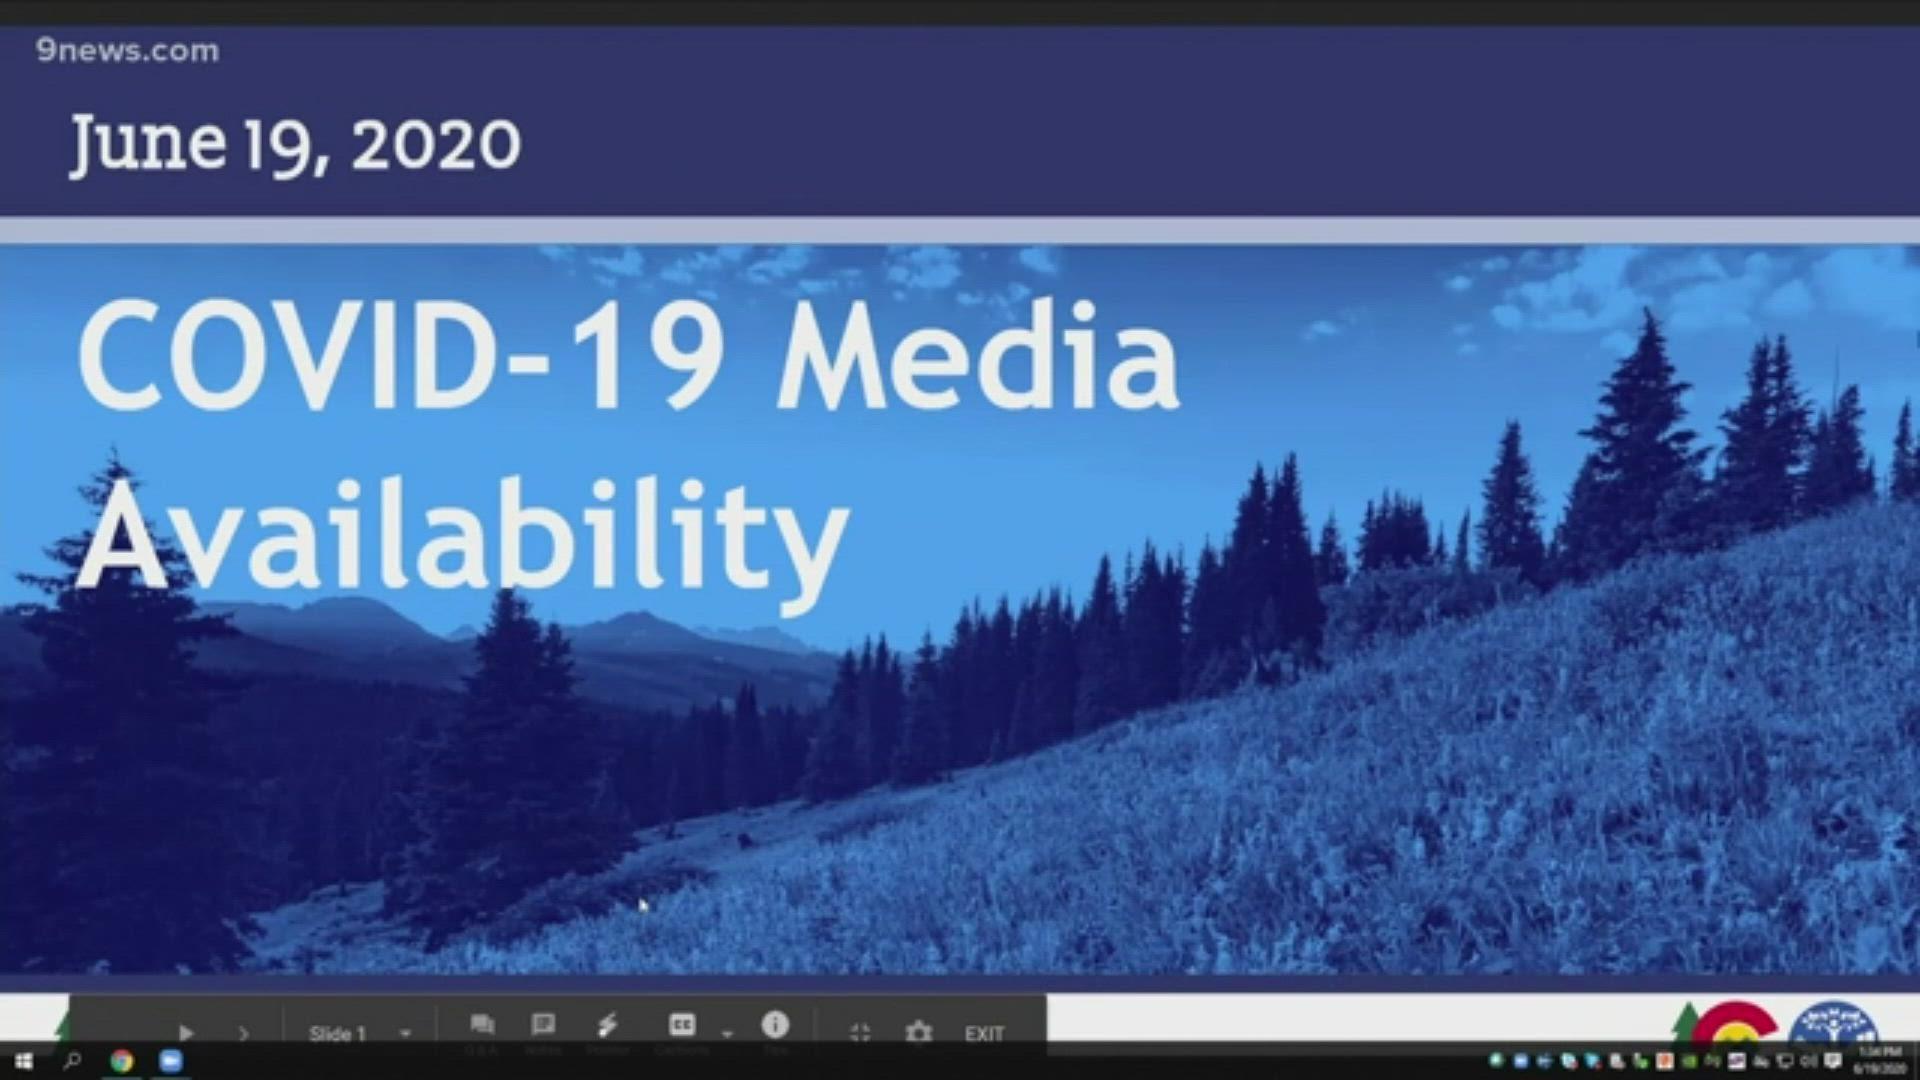 Colorado Coronavirus Health Officials Tourism Office Update 9news Com